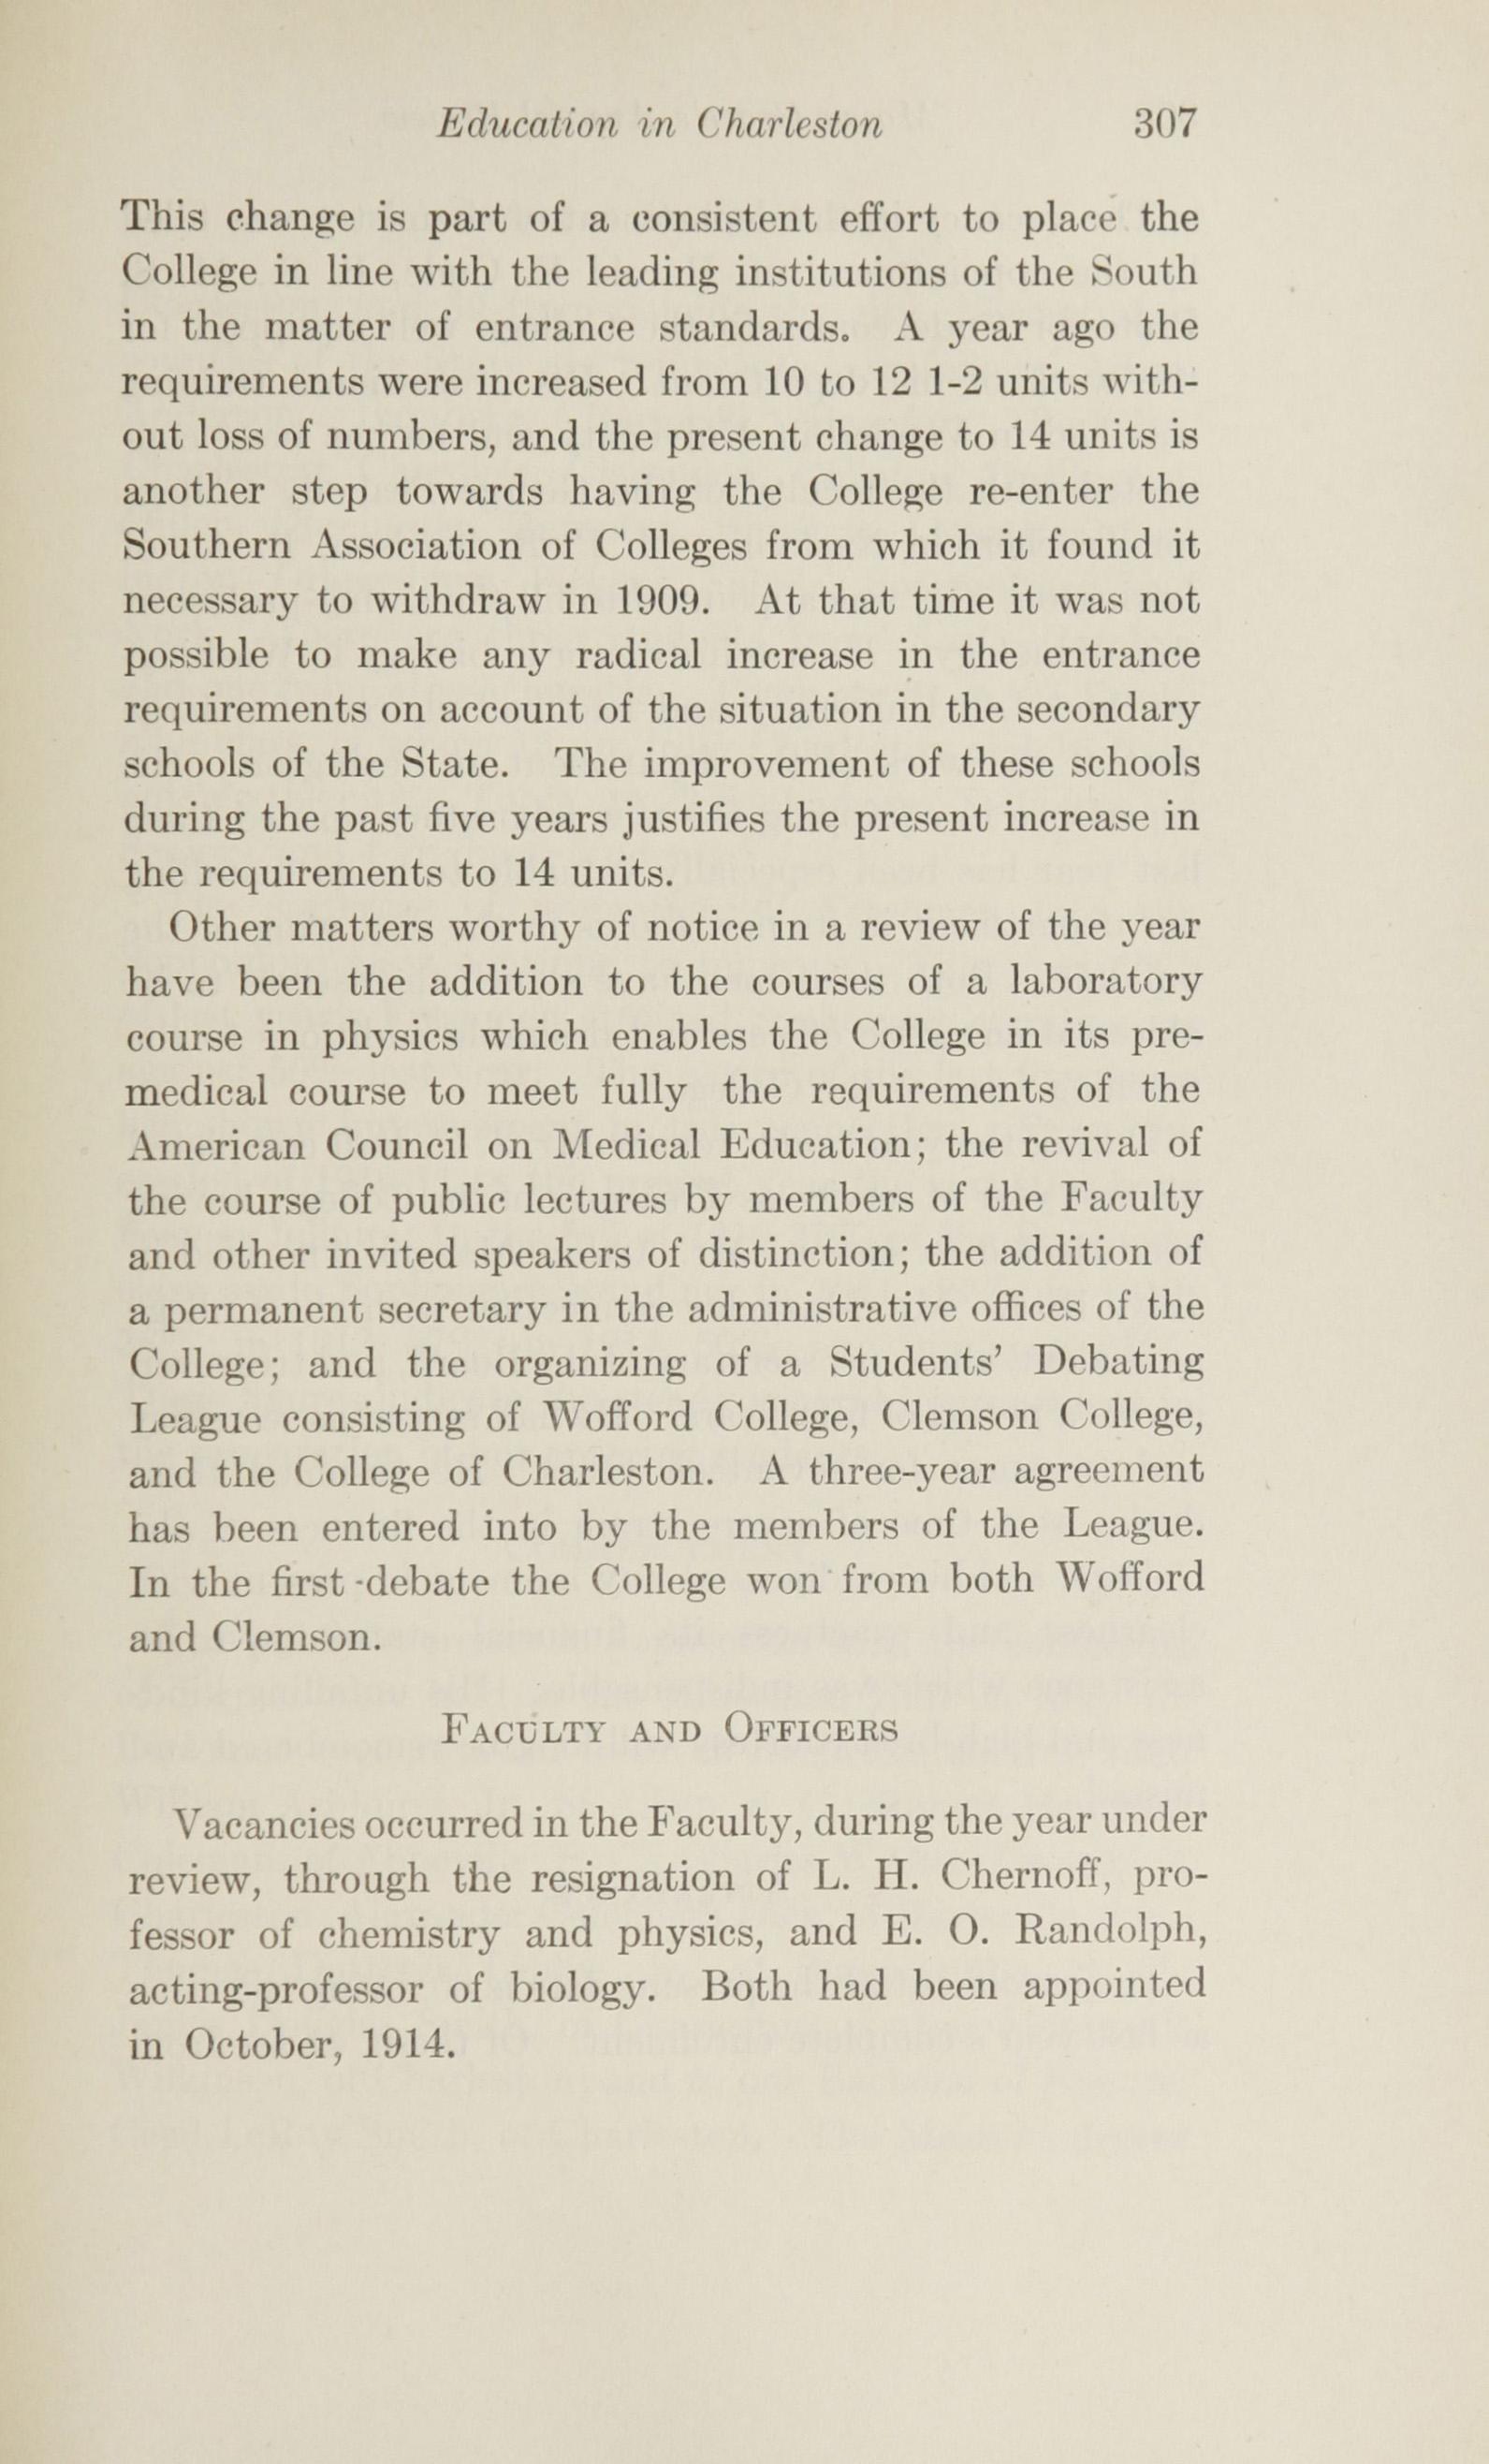 Charleston Yearbook, 1915, page 307